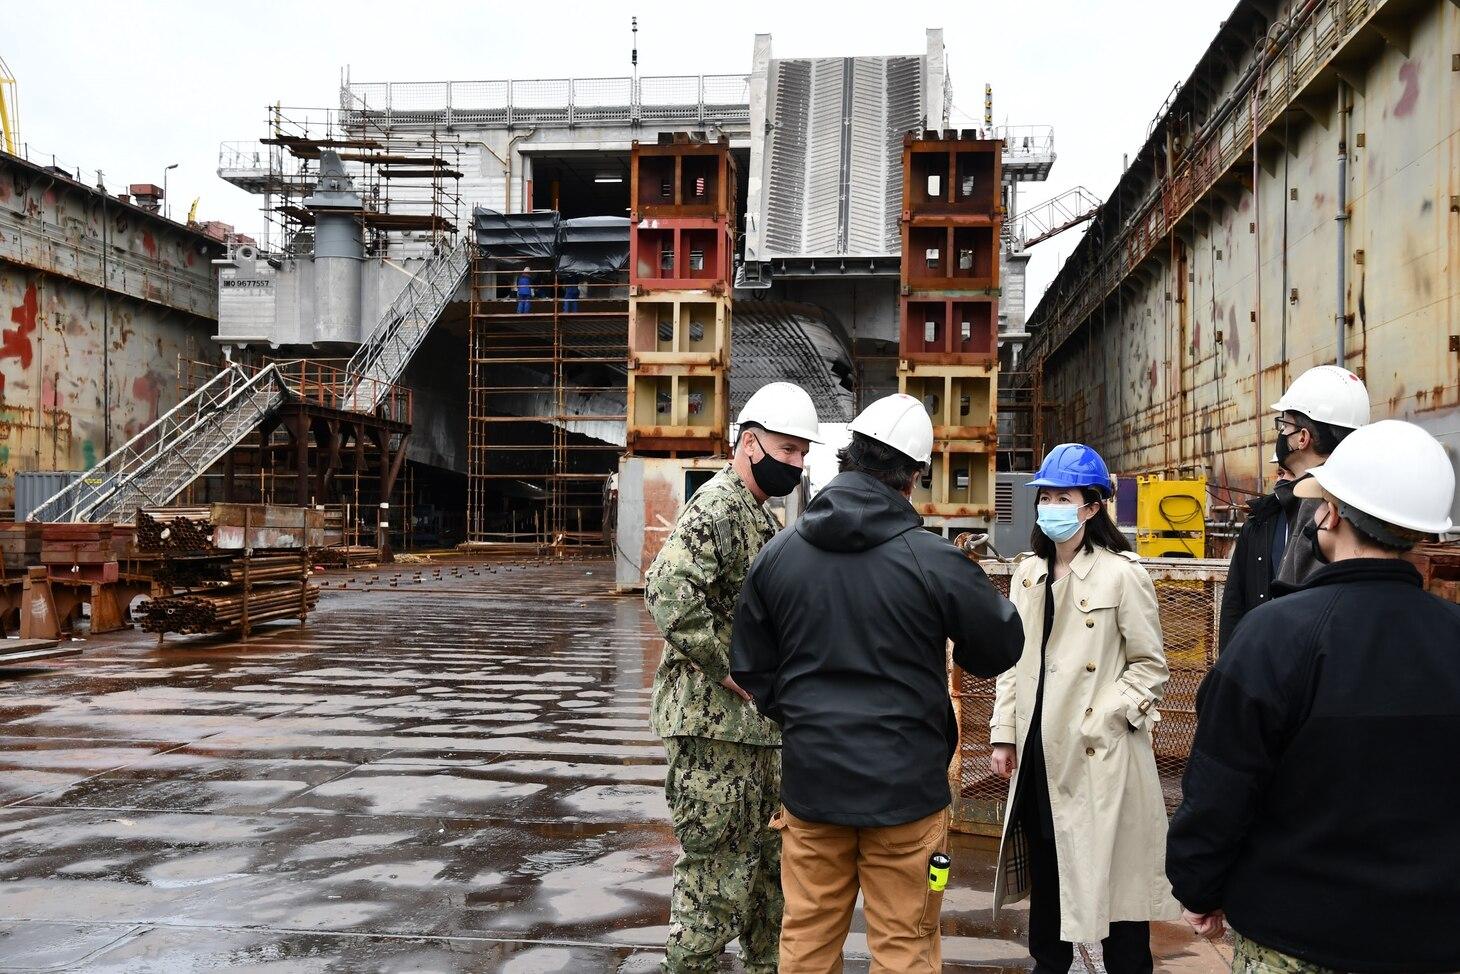 Vice Adm. Gene Black, commander, U.S. Sixth Fleet, visited Rijeka, Croatia, on April 27th to speak with Croatian military leadership and meet with crews of three U.S. Navy ships undergoing lifecycle maintenance at the Viktor Lenac shipyard.